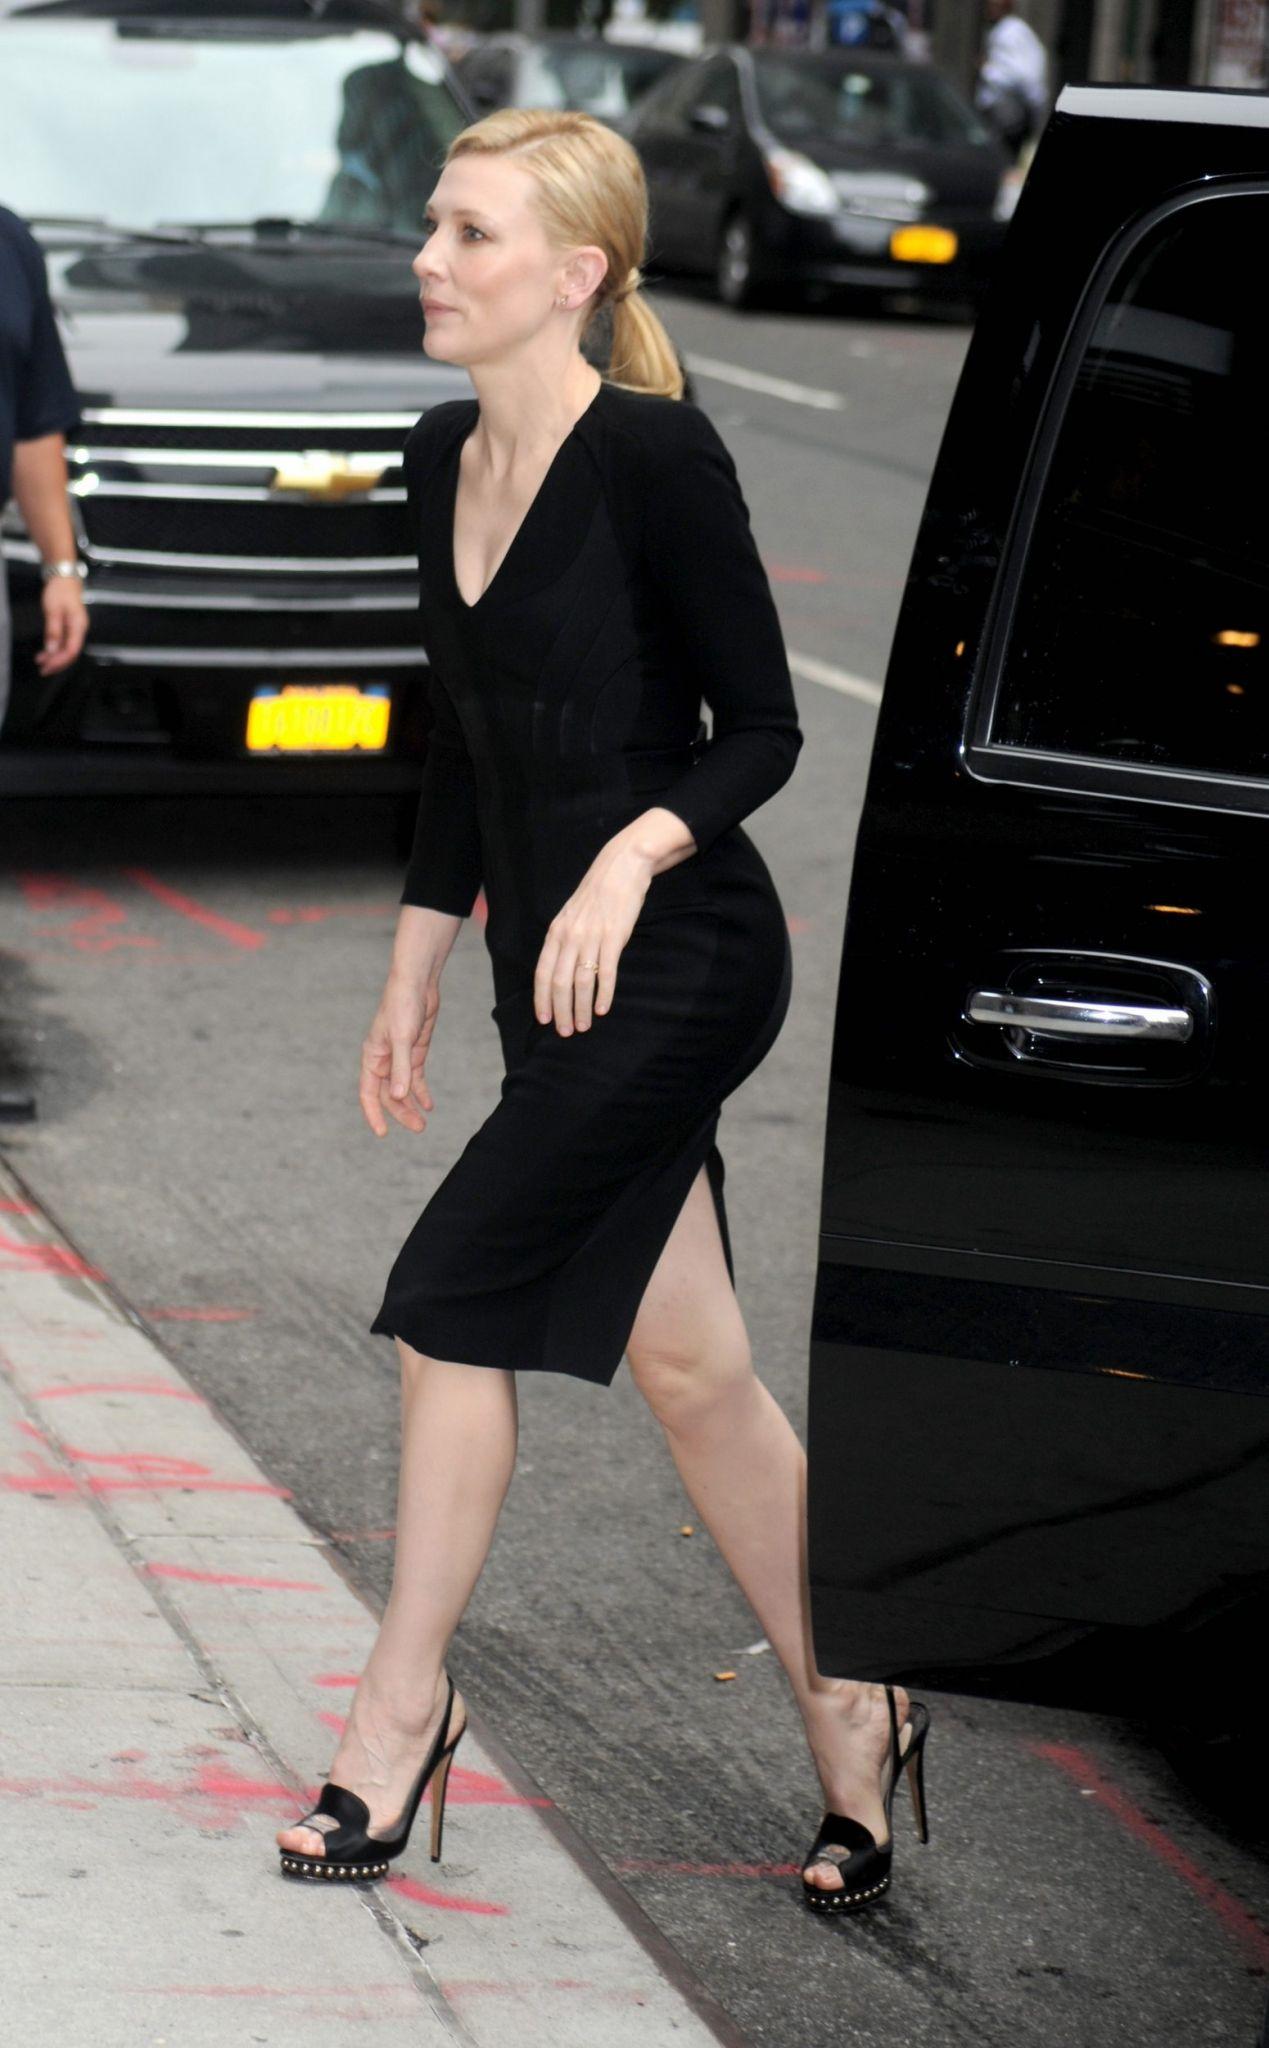 Top rated - 043 - Cate Blanchett Fan   Cate Blanchett Gallery